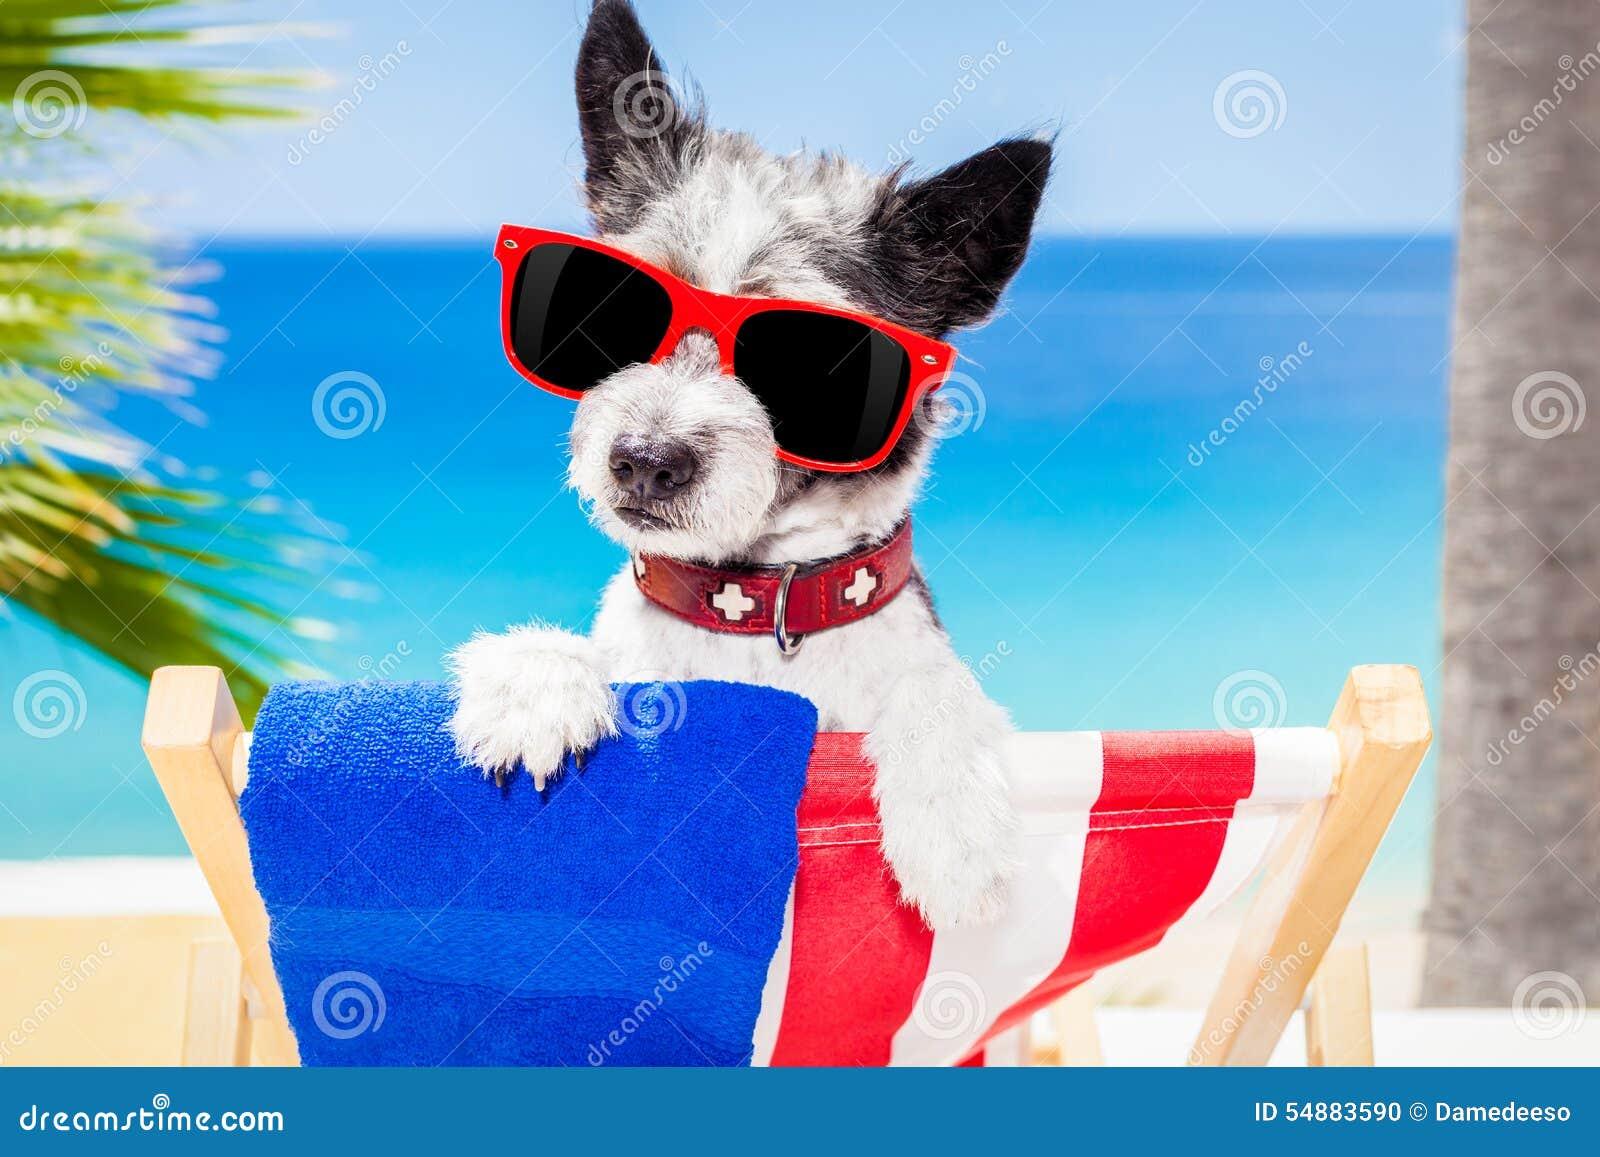 Dog Summer Holiday Vacation Stock Photo - Image: 54883590 Relaxing Dog Music Audio